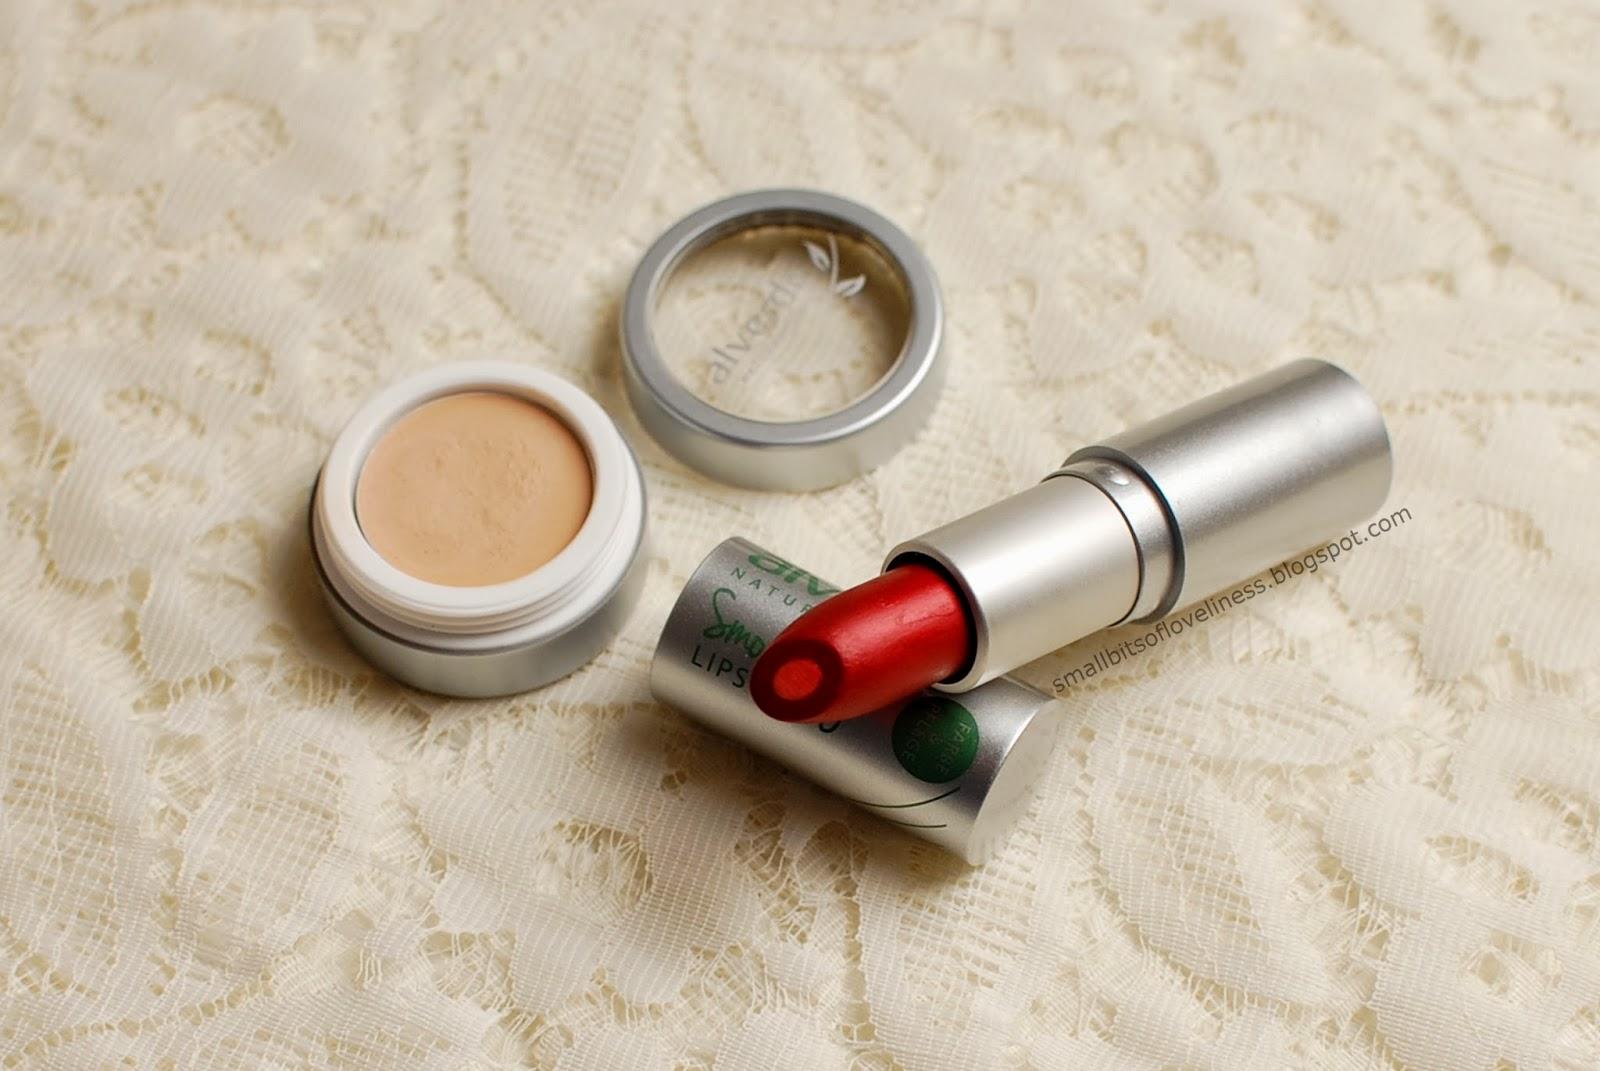 Alverde Concealer, Smoothing Lipstick